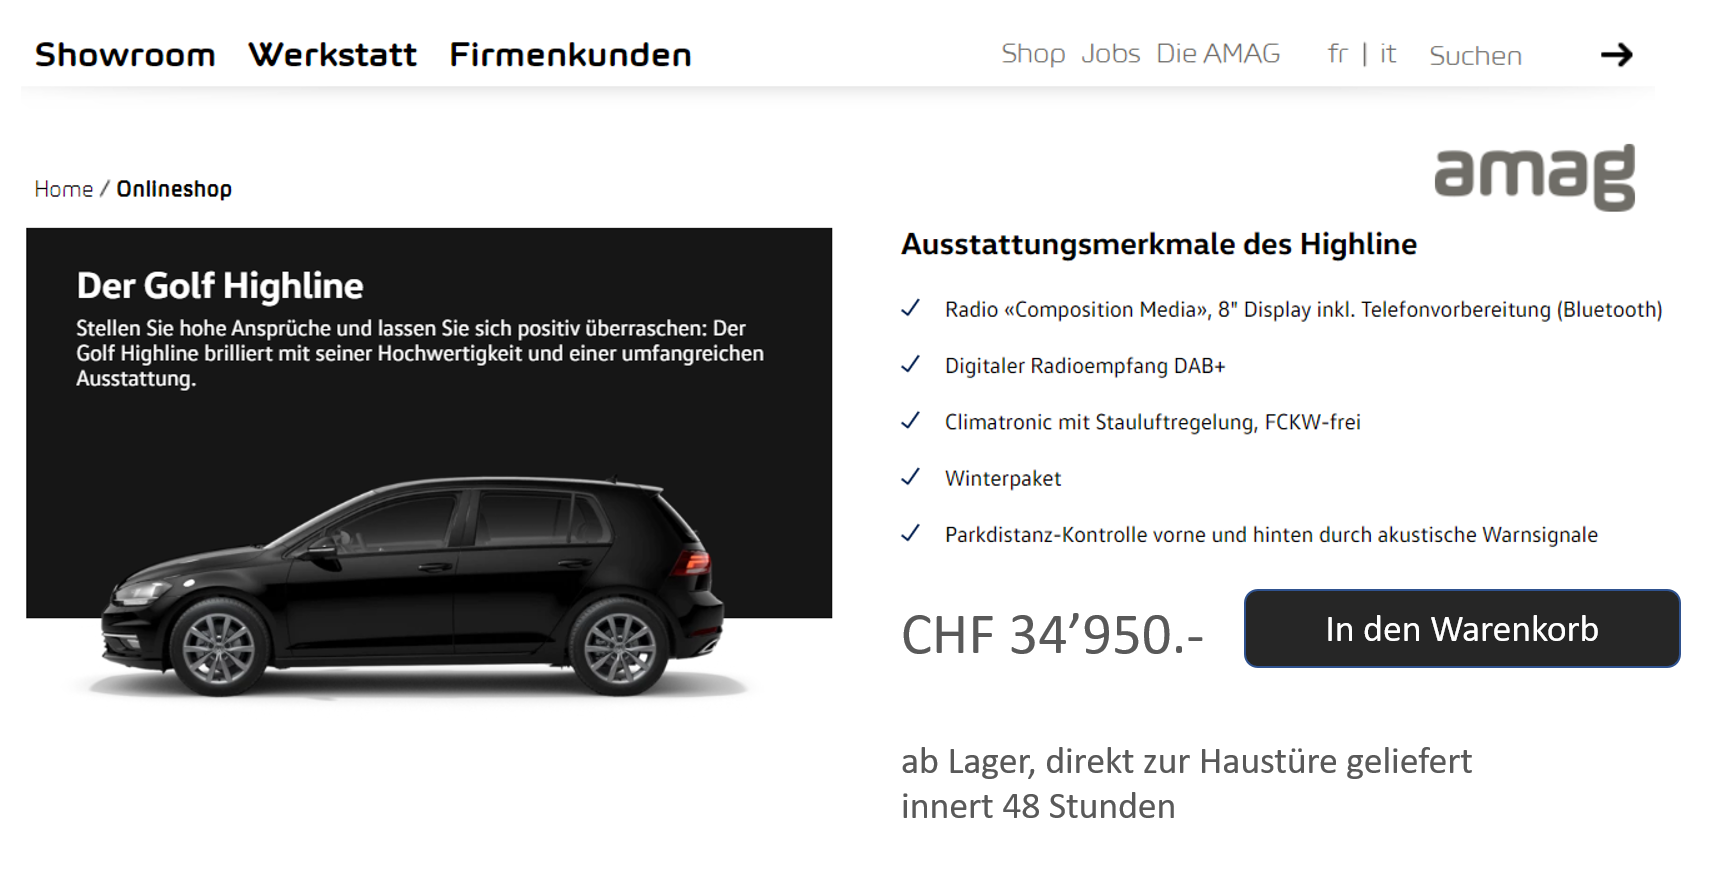 Auto-Onlineshop der Amag / Mockup - Visualisierung Carpathia AG